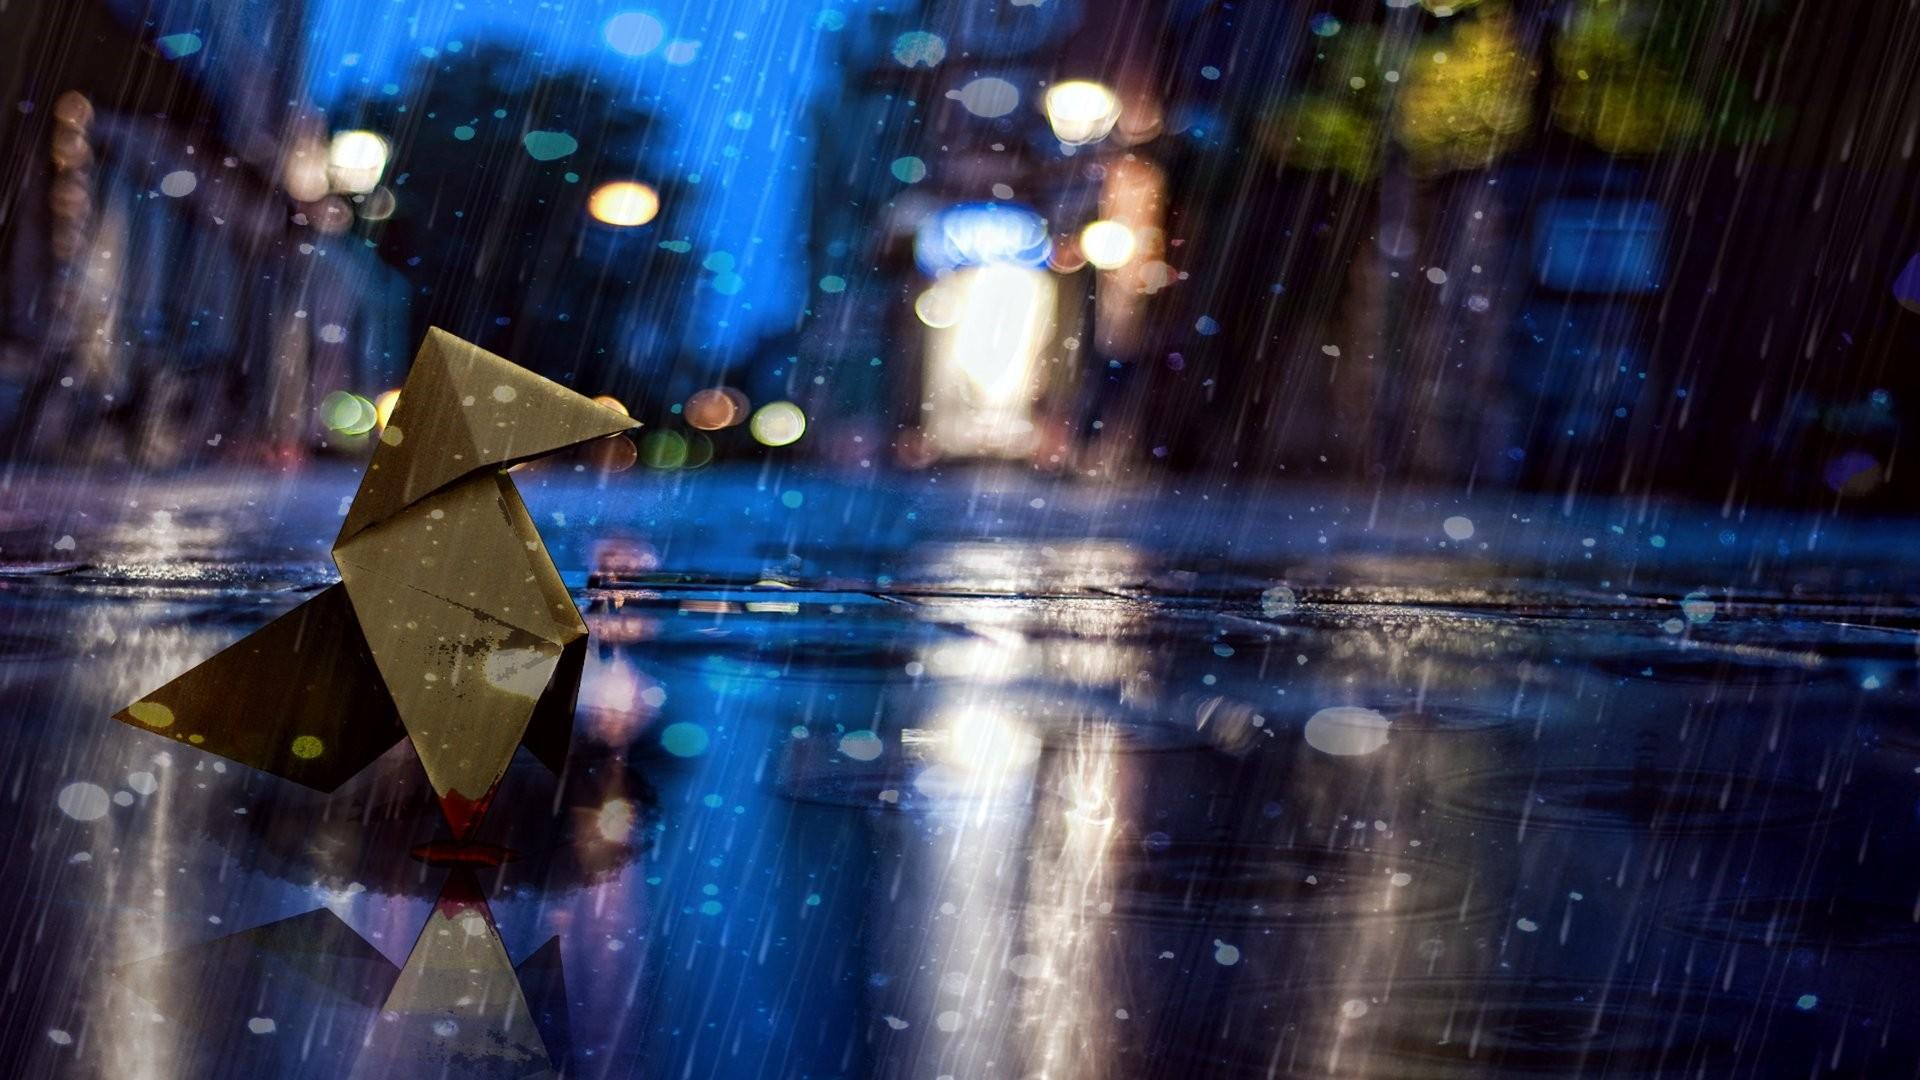 Rain High Quality